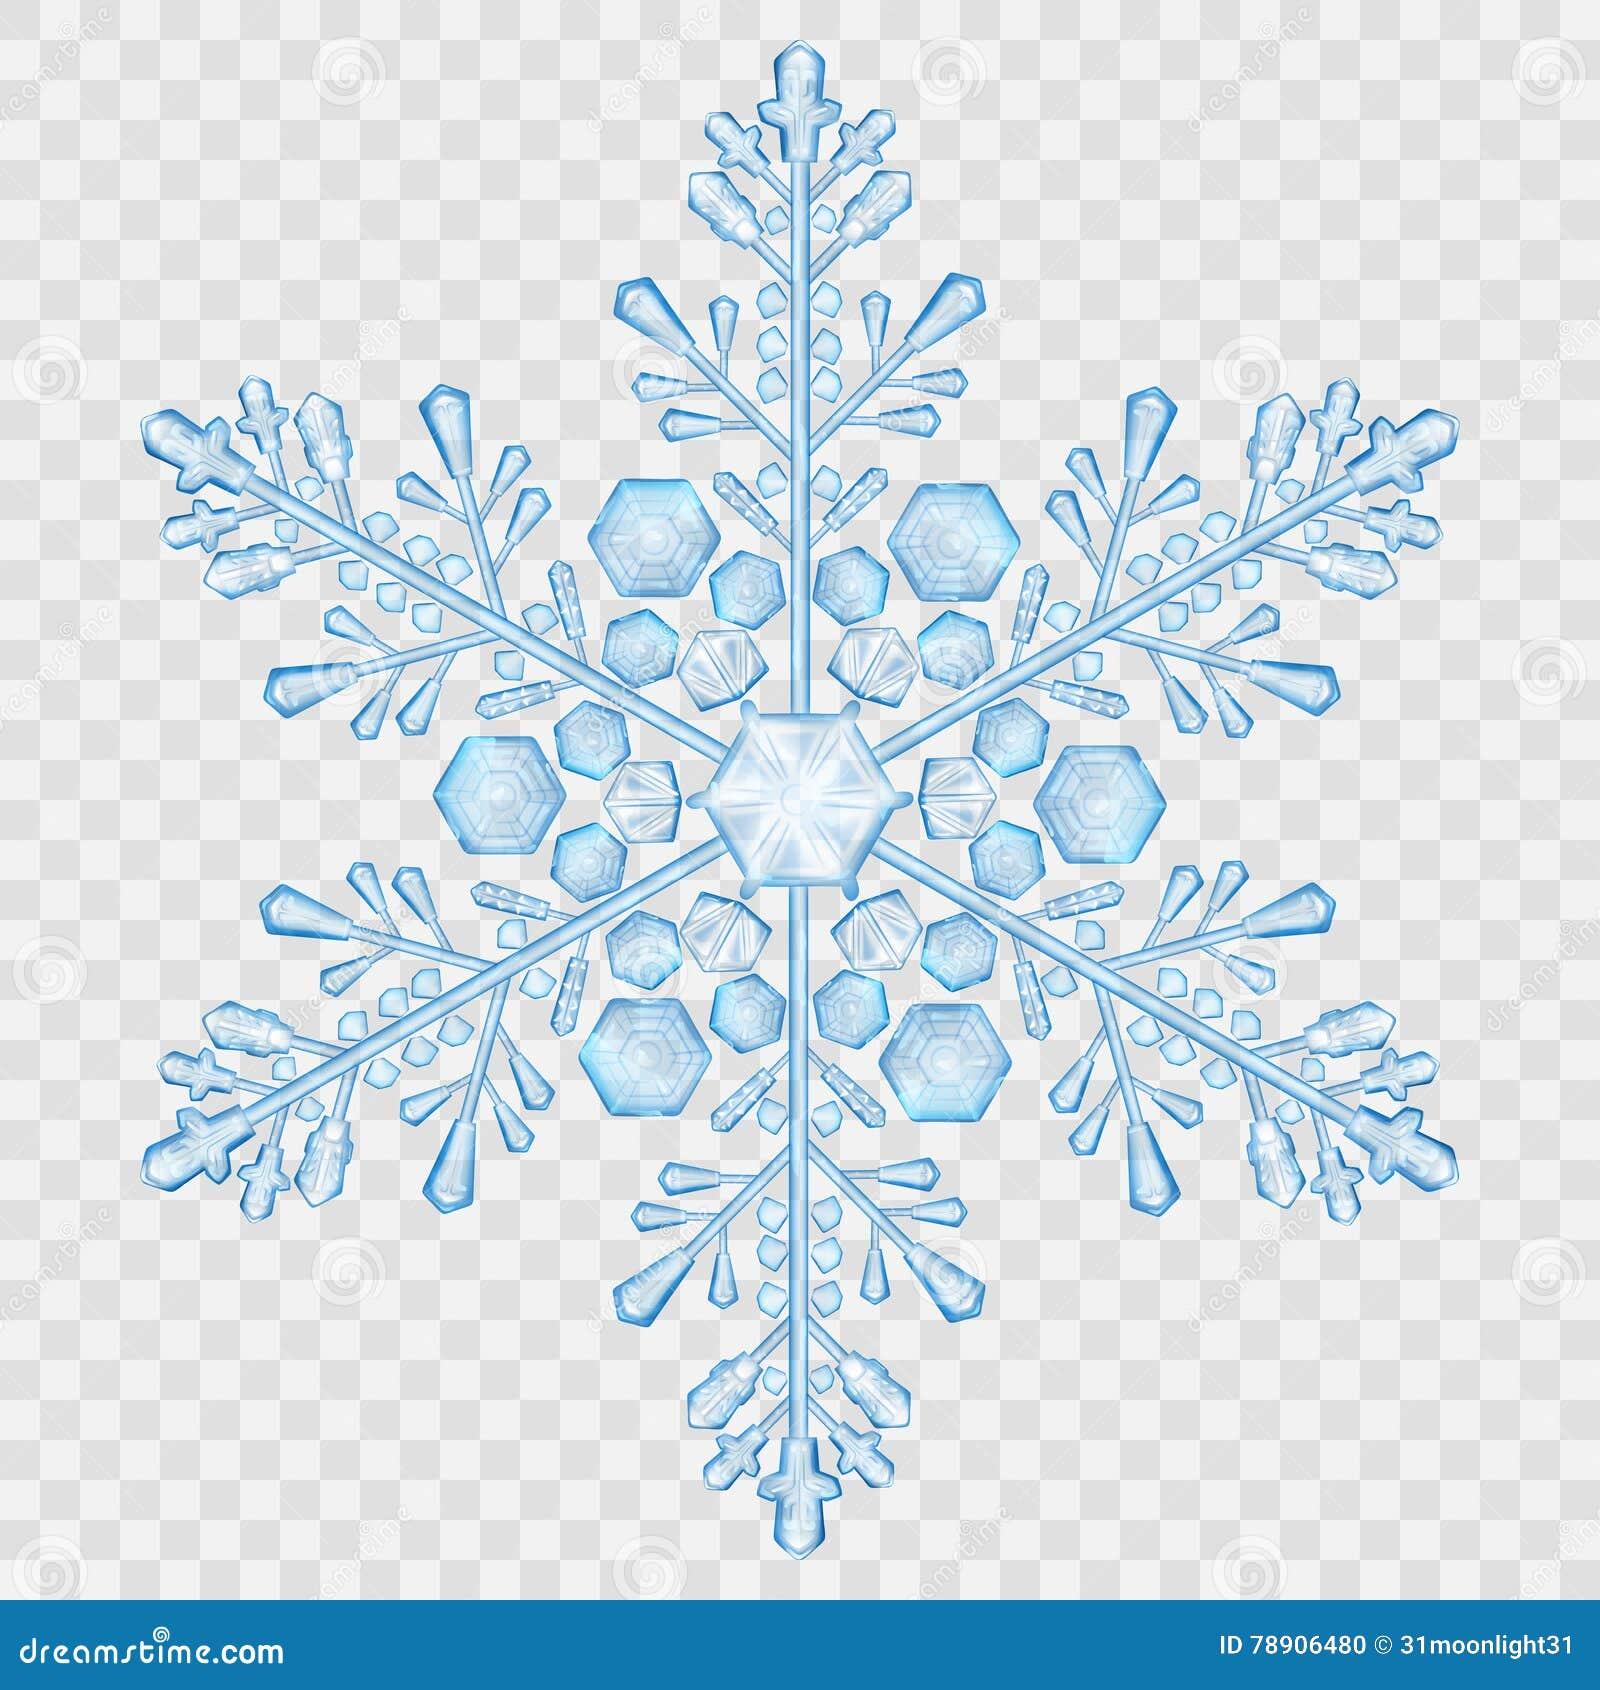 Big translucent crystal snowflake stock vector